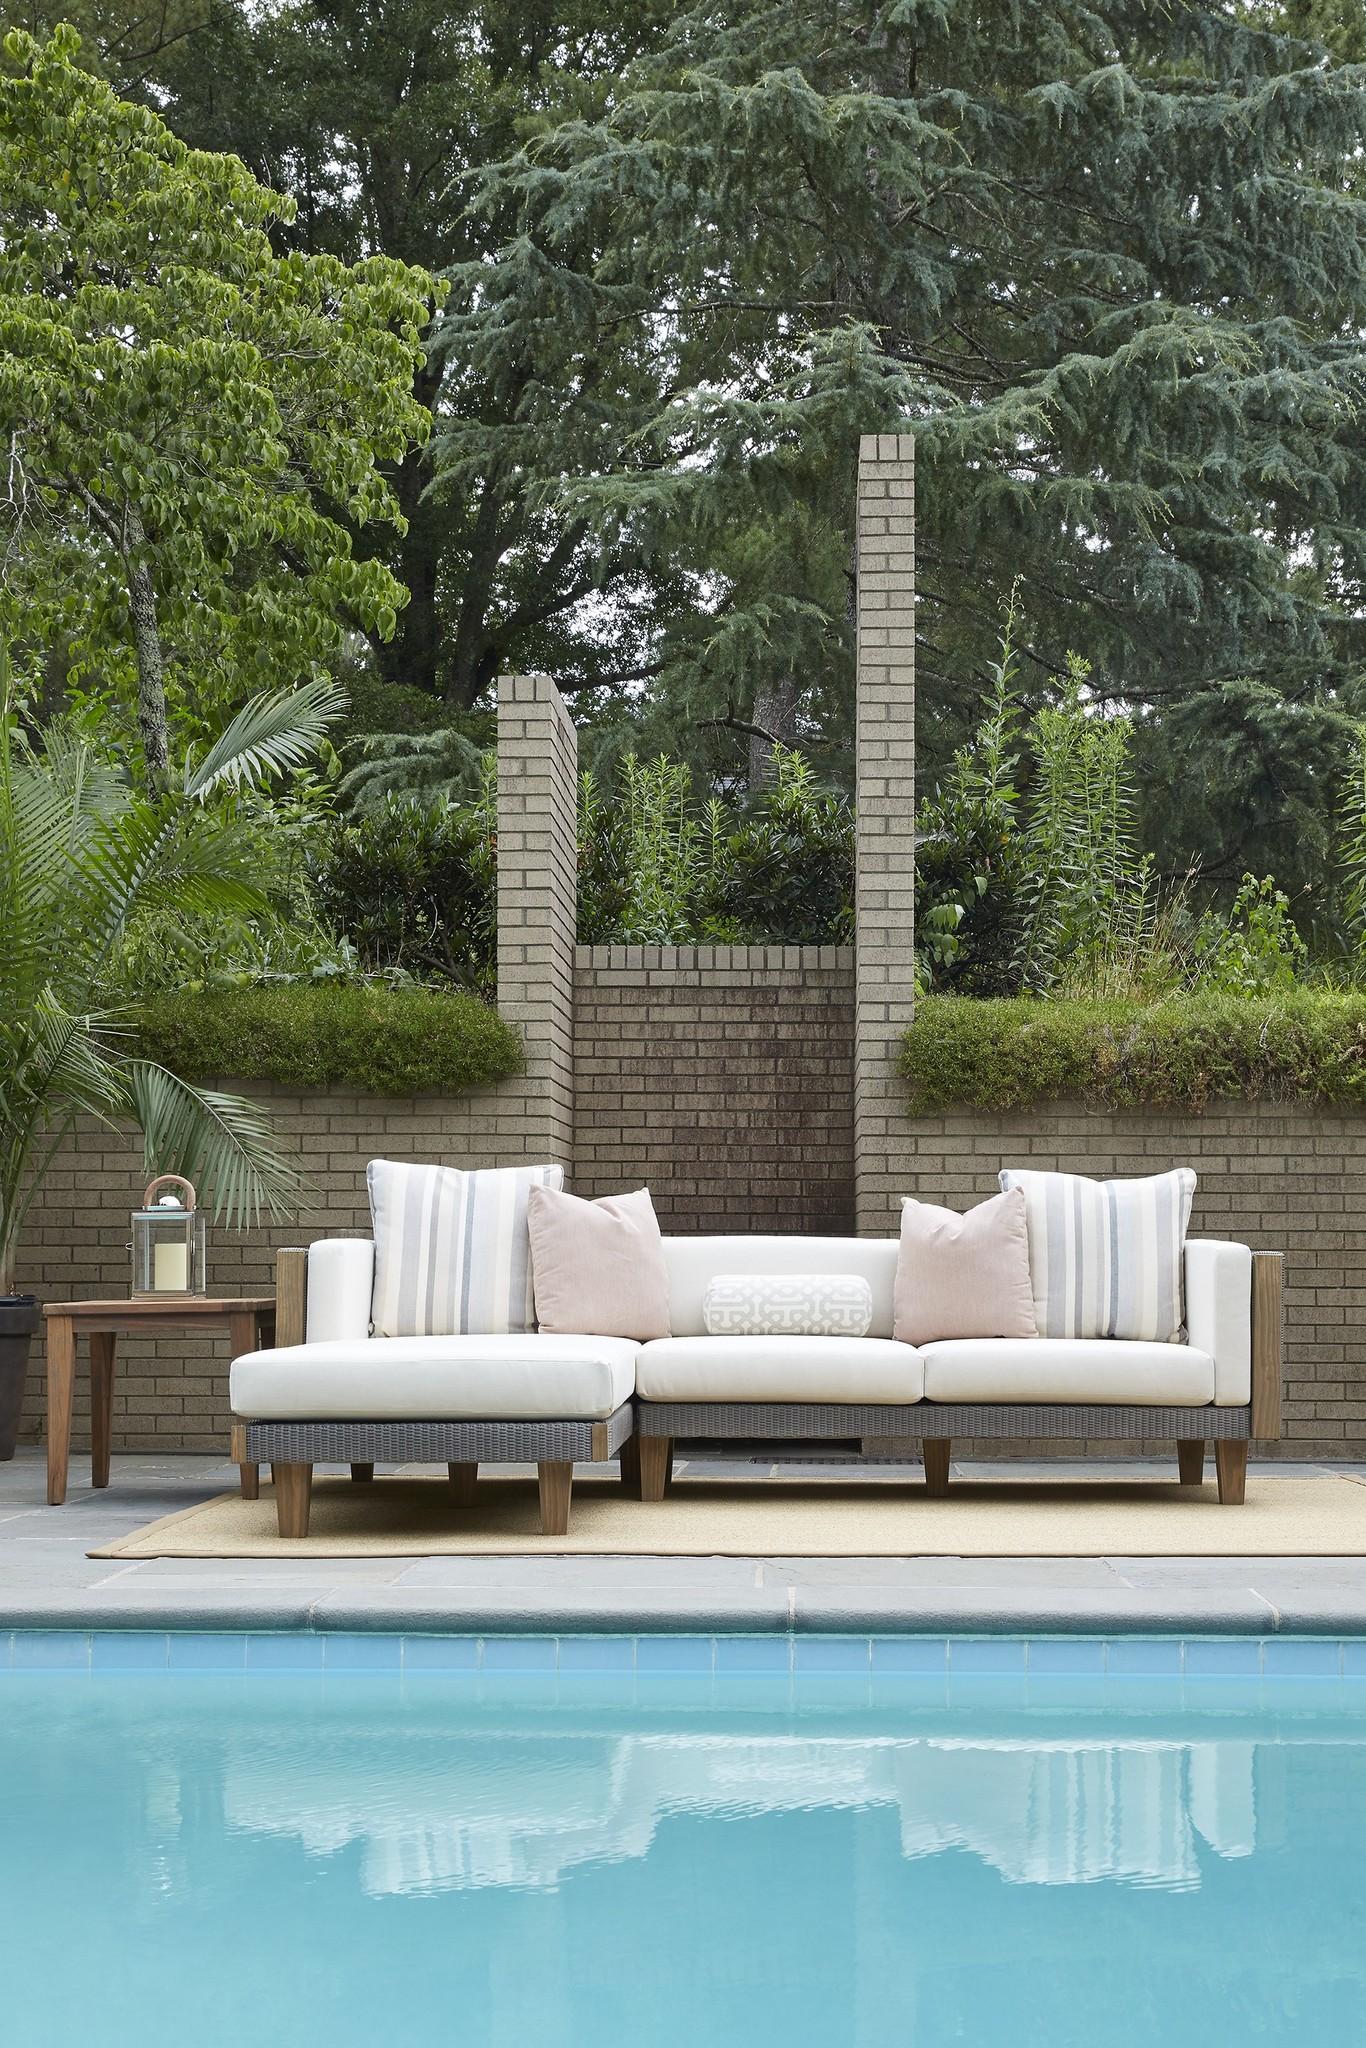 Luxury Outdoor Furniture Showcase - Hauser's Patio